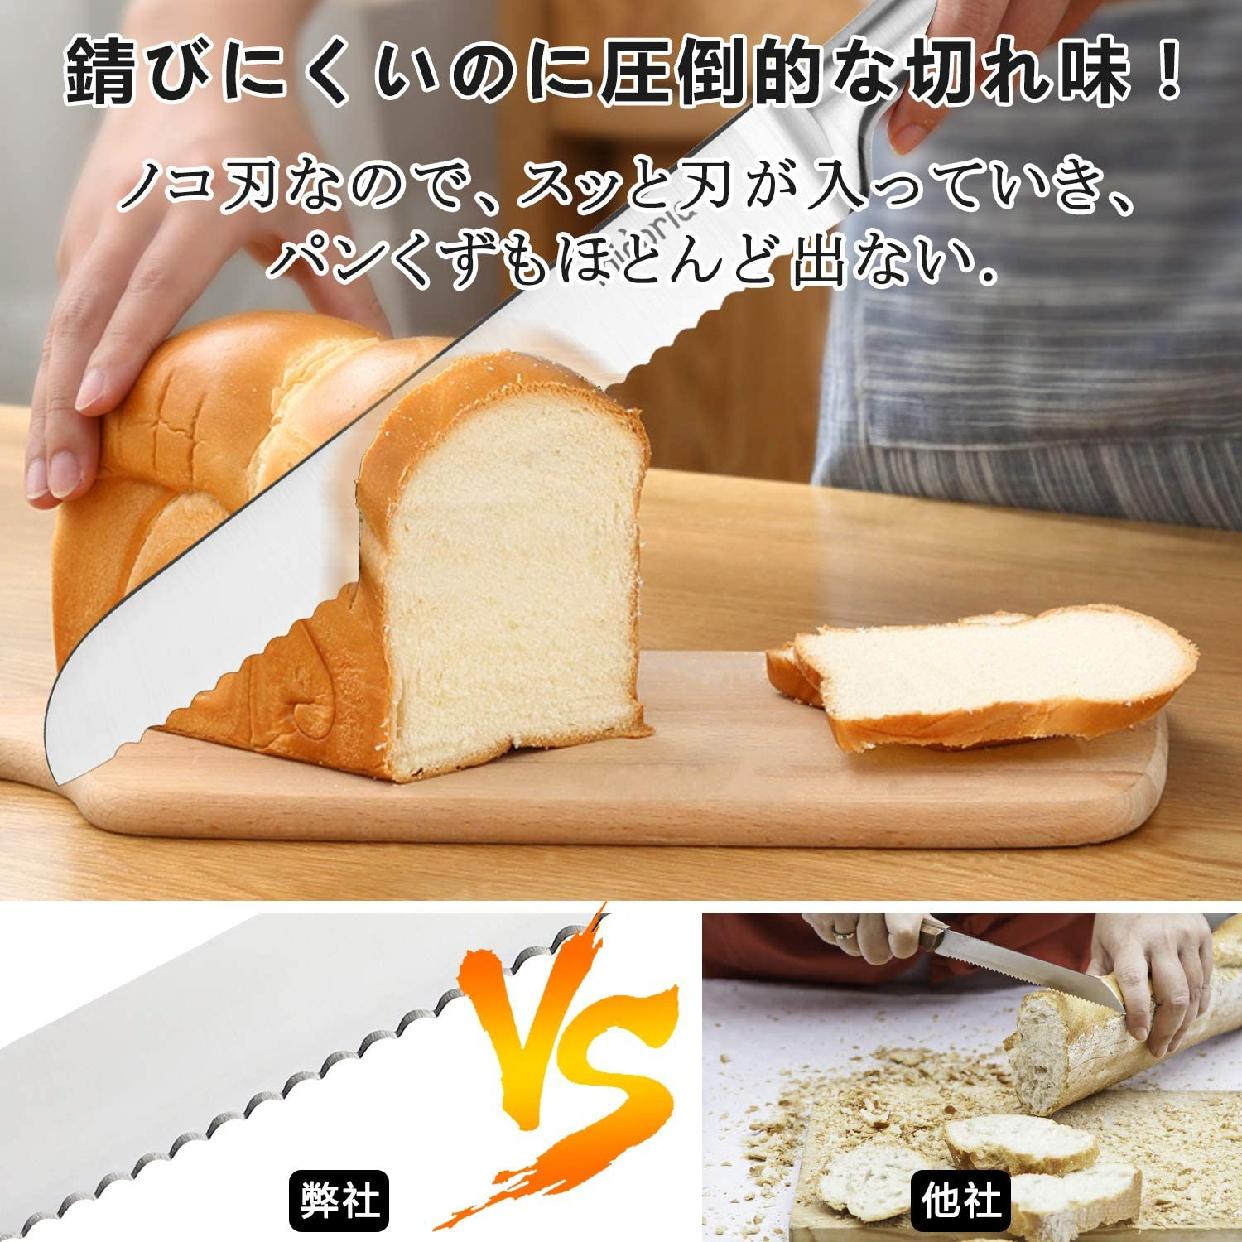 MIDORIA(ミドリア) パン切りナイフ シルバーの商品画像4